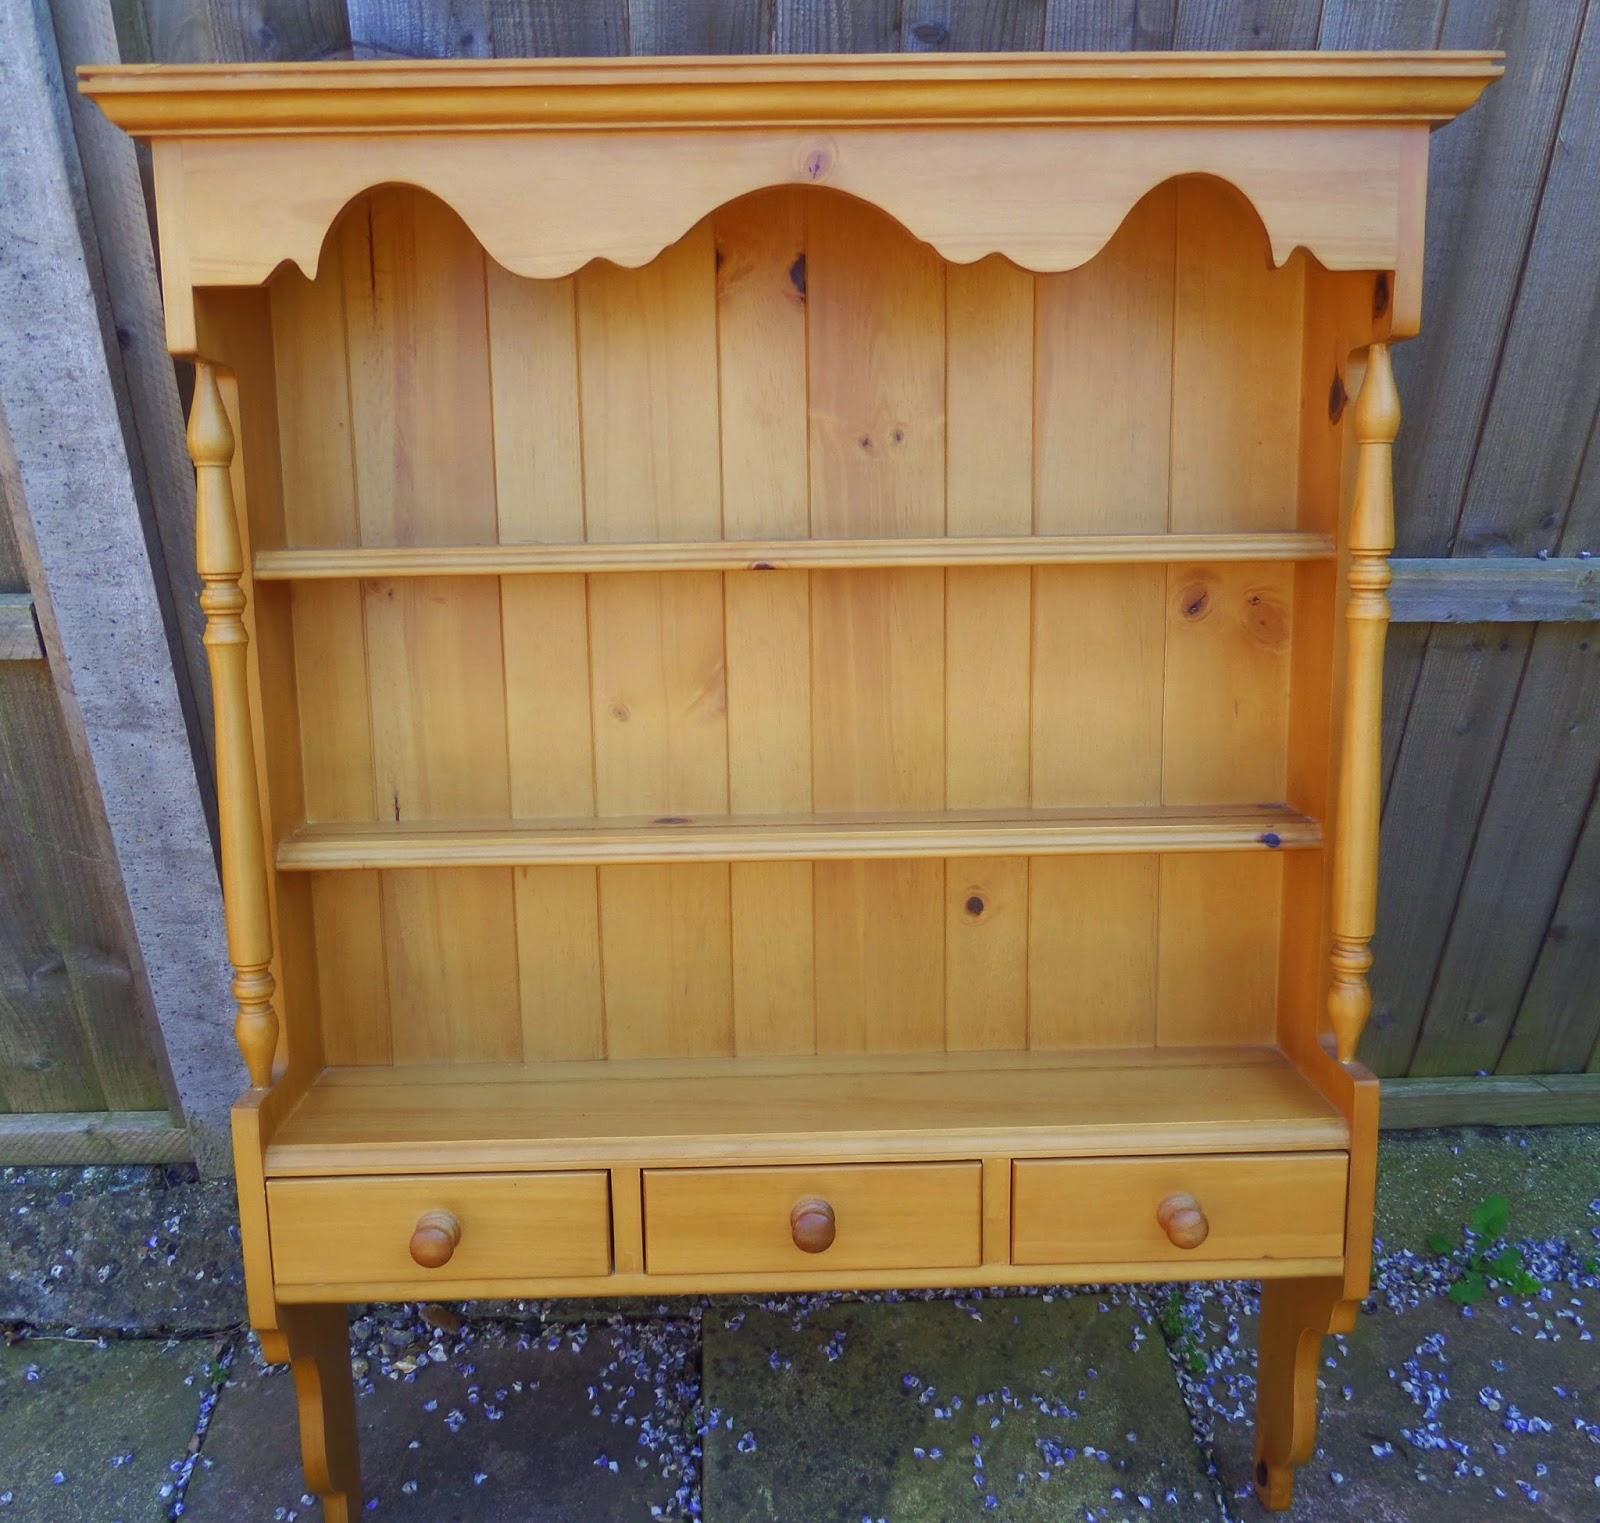 Diy Wooden Spice Rack: DIY: Shabby Chic Spice Rack From EBay